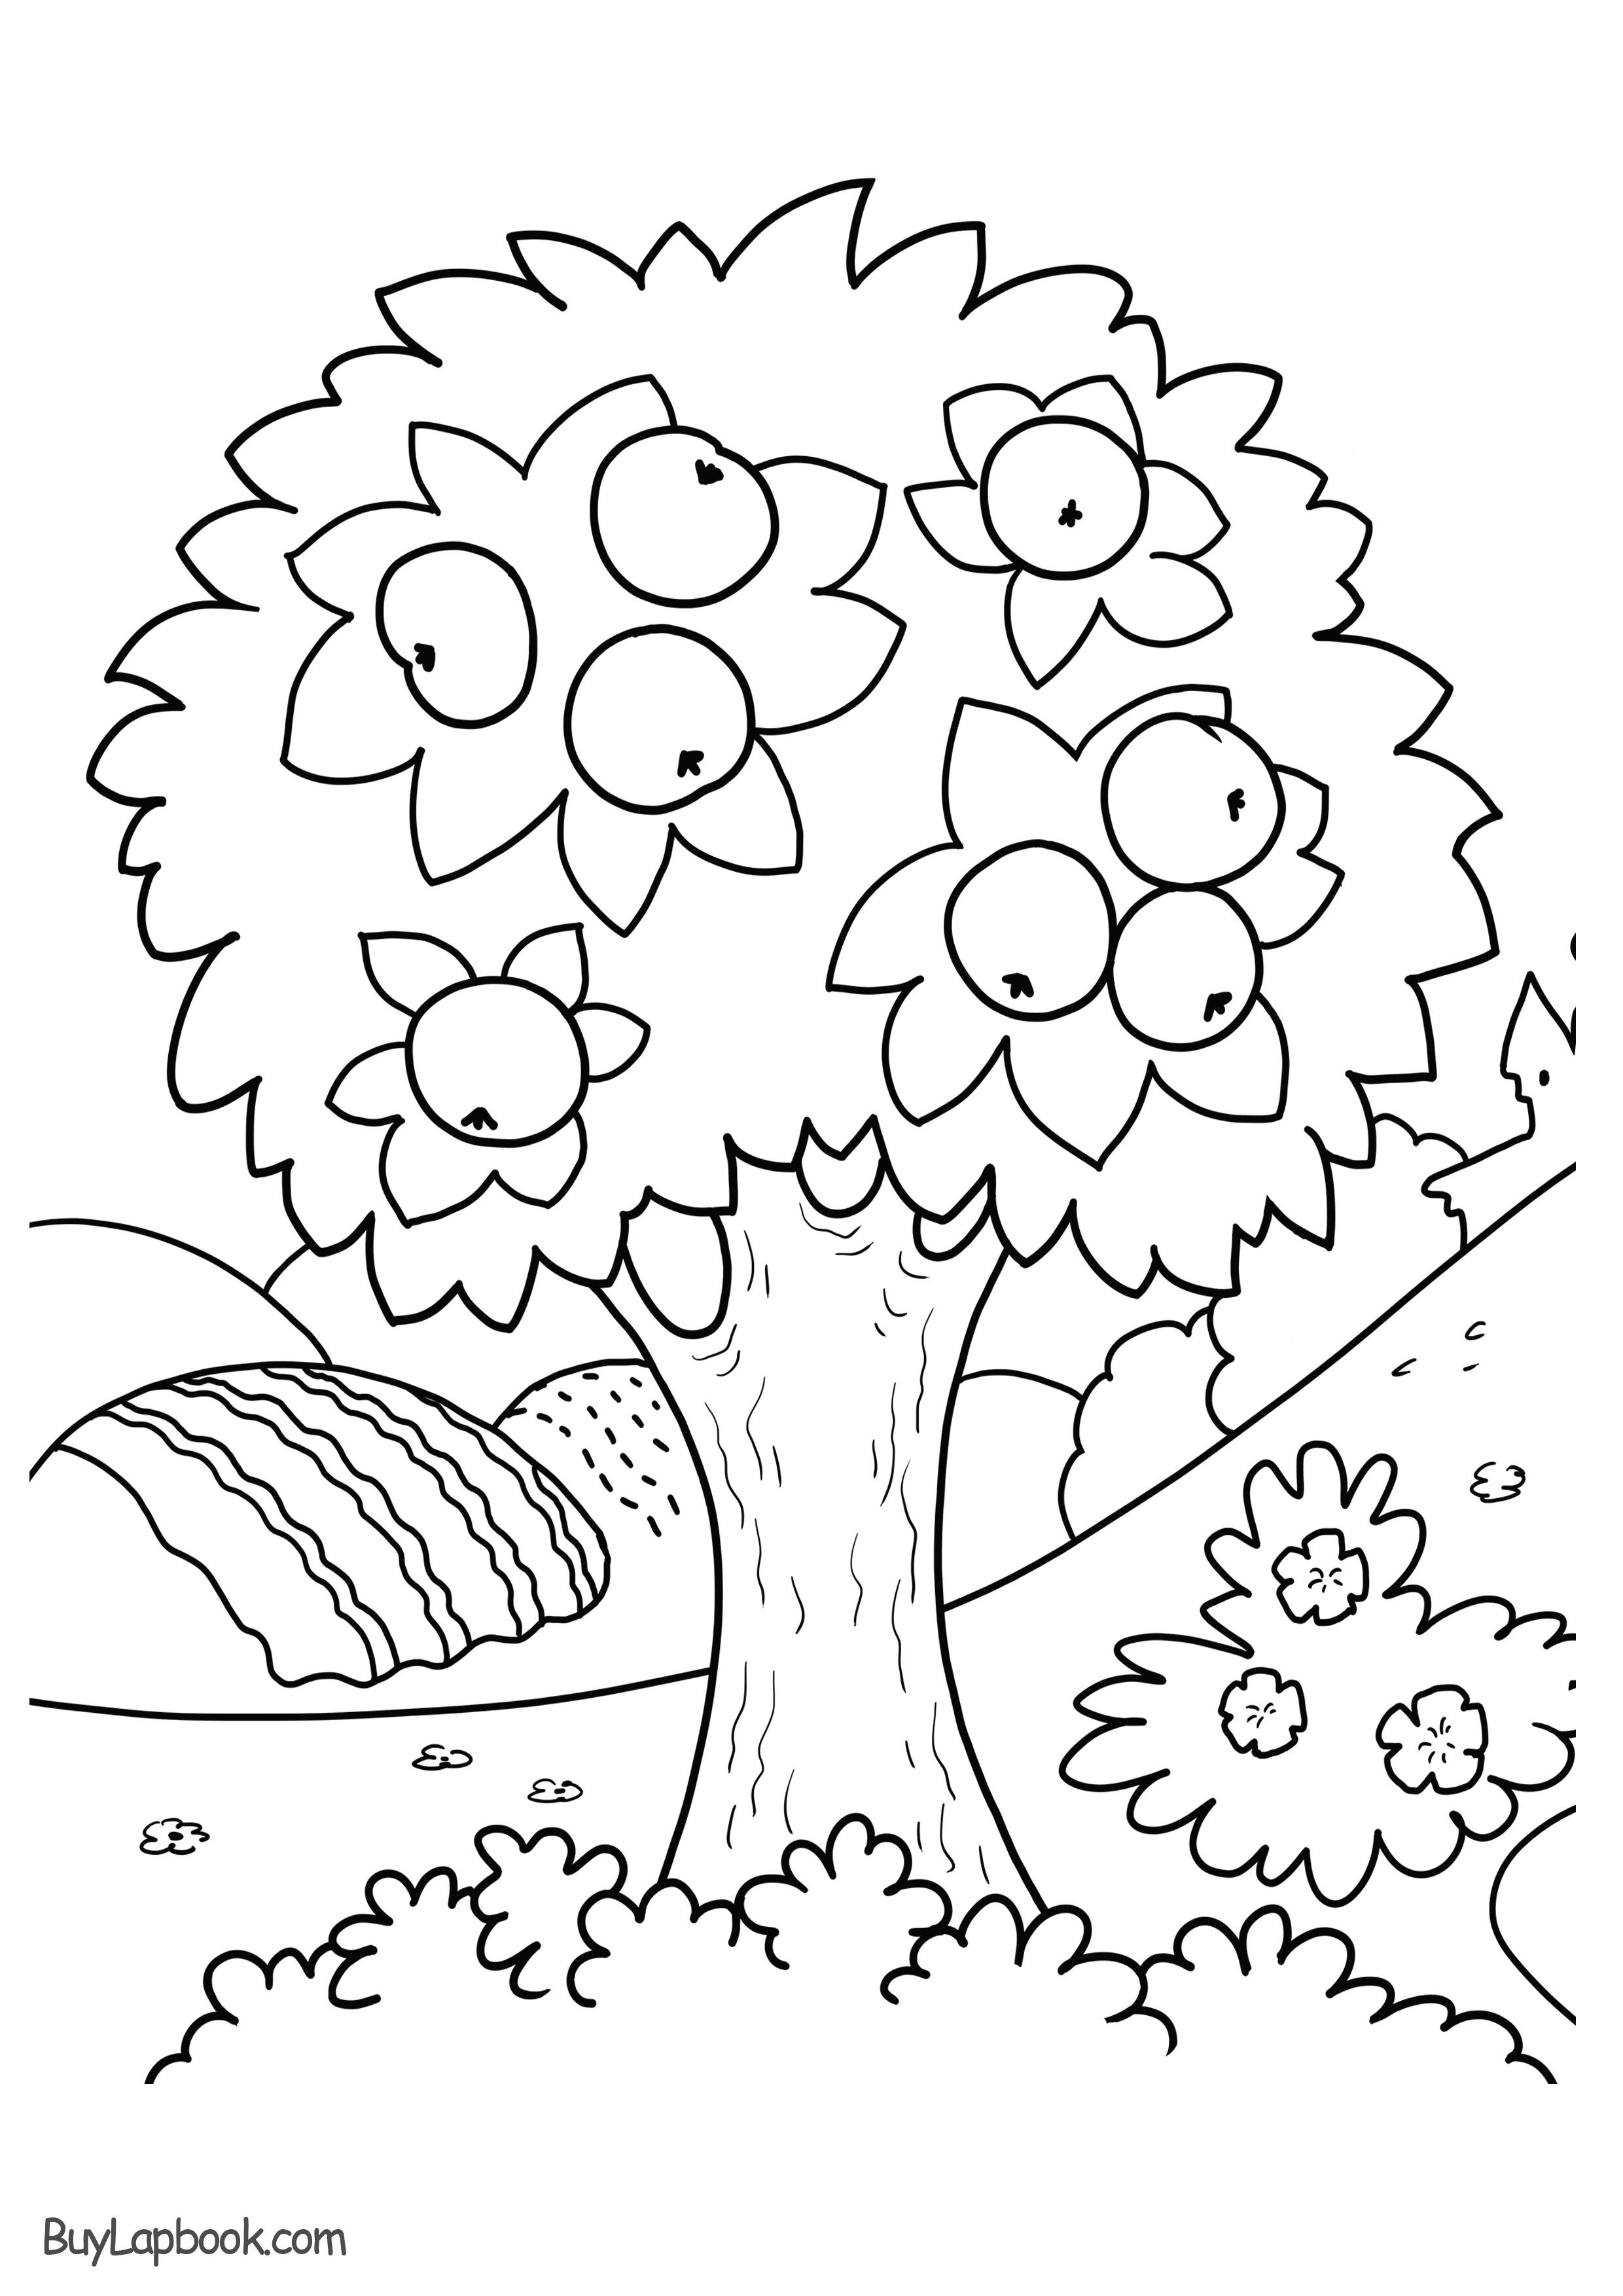 Apple Tree Coloring Page Free Printable - BuyLapbook